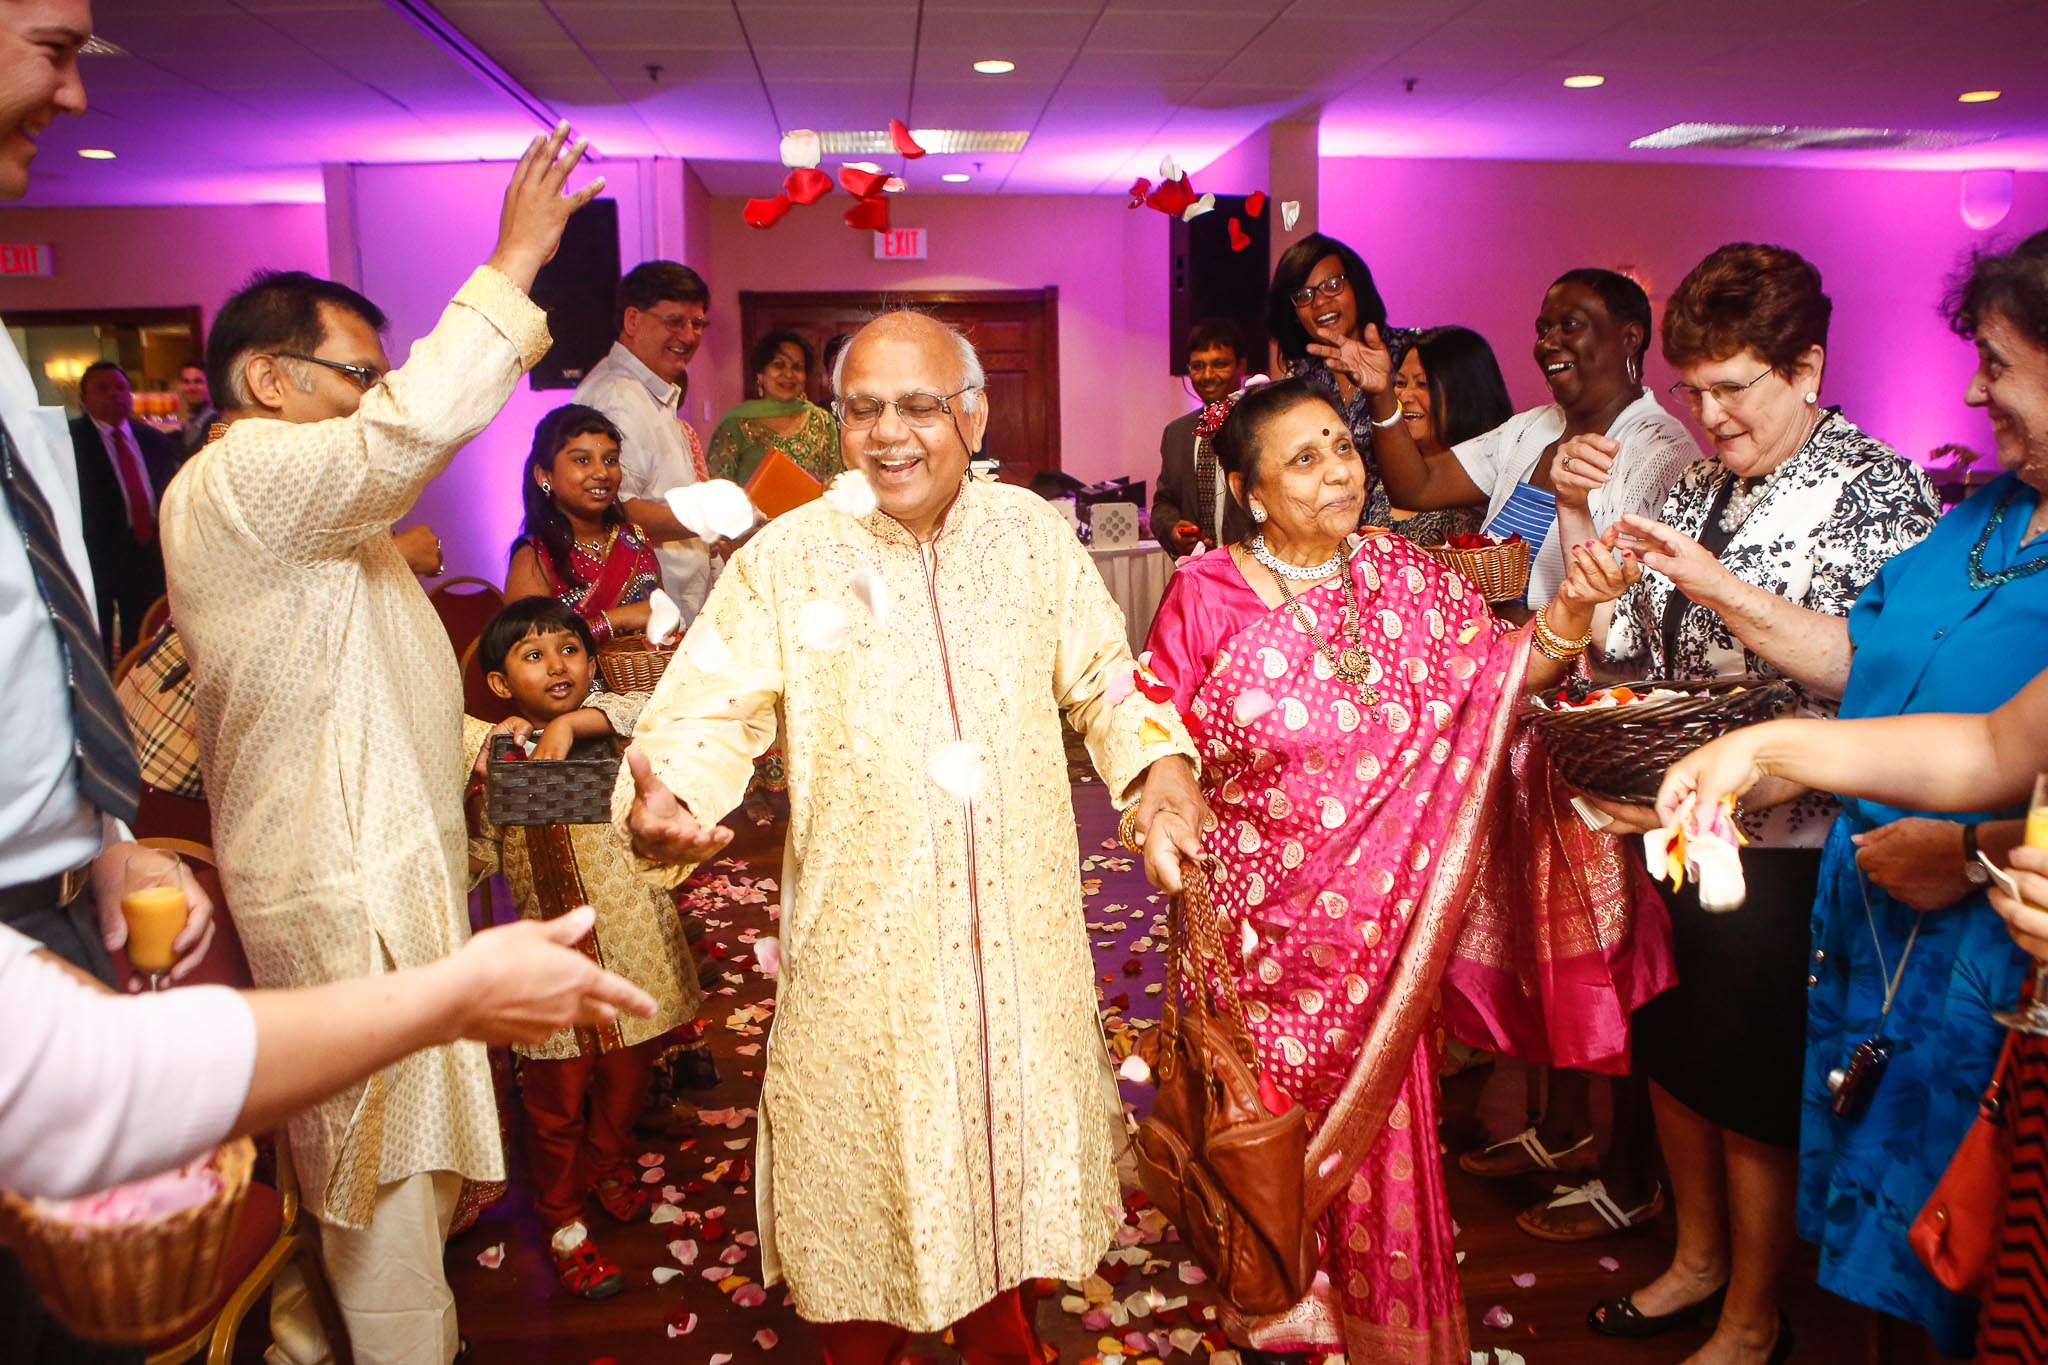 DC Indian wedding photographer,Wyndham Garden Exton Valley Forge wedding dc south asian wedding photographer, downington pennsylvania wedding indian photographer, downington pennsylvania wedding, (2 of 44).jpg